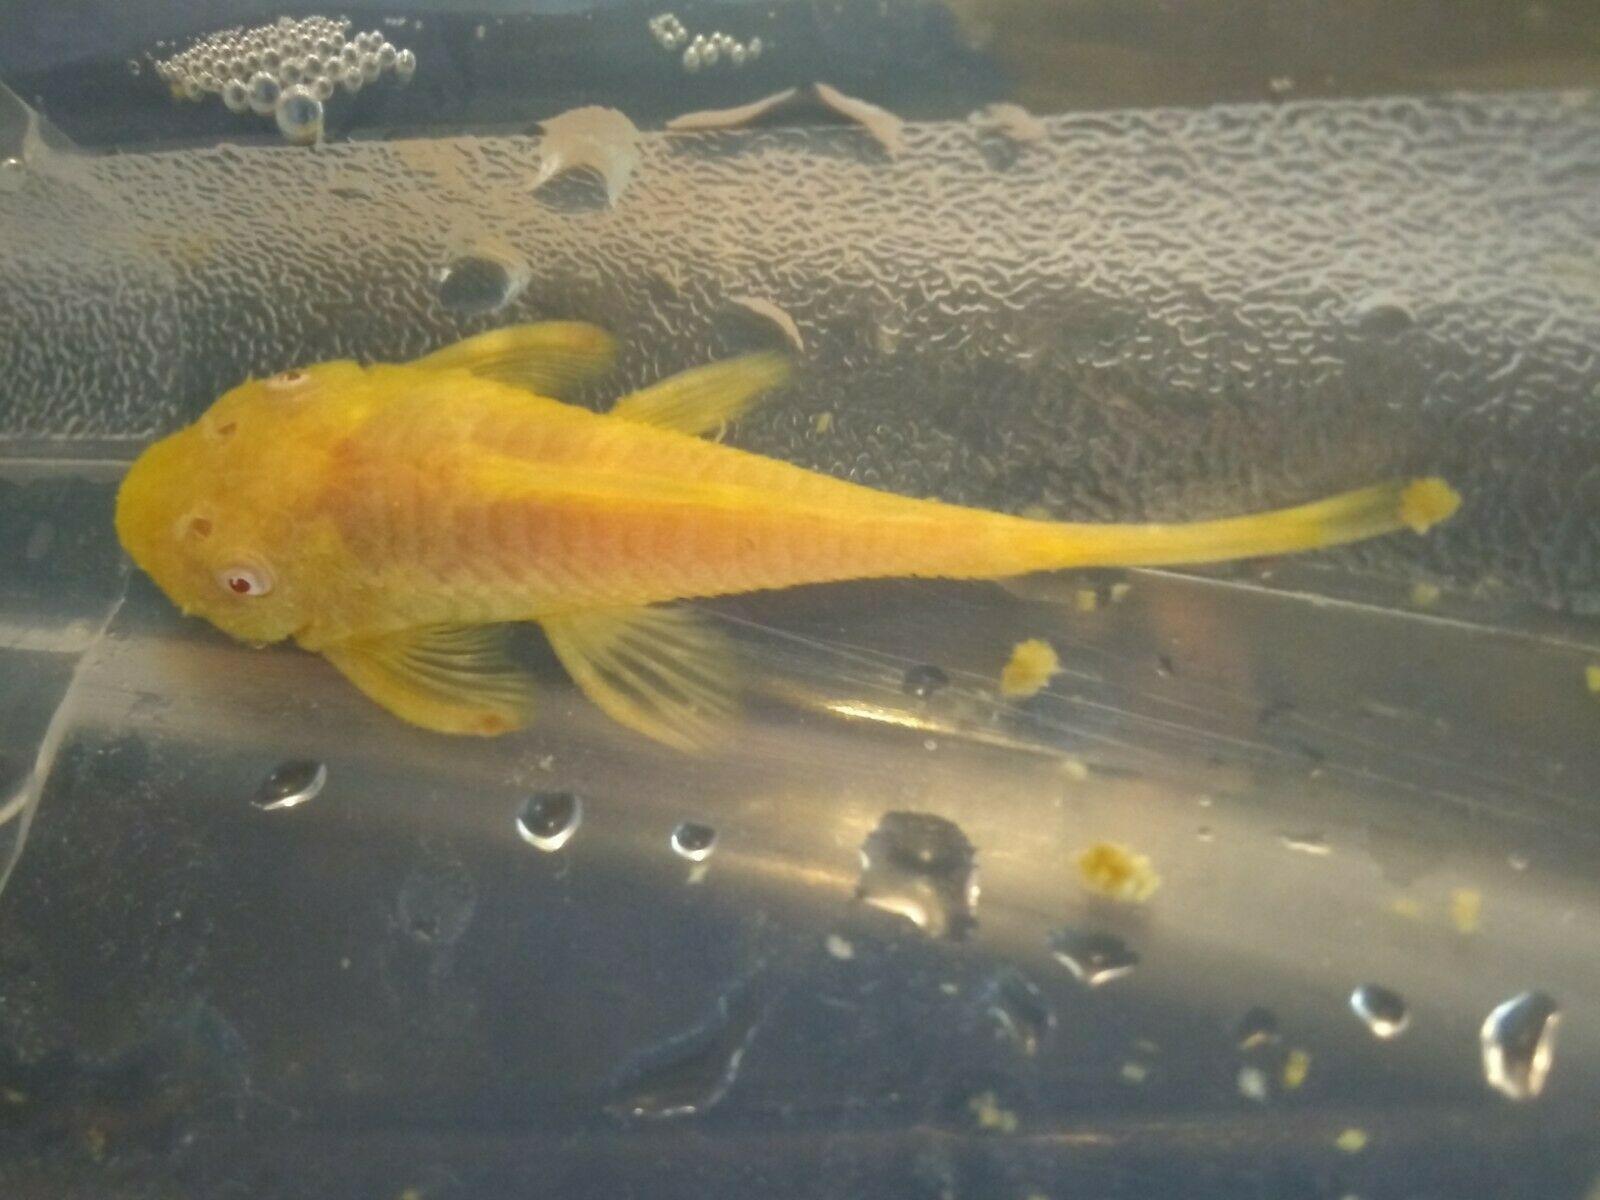 Lemon Albino Bristlenose Pleco 2 3 Sub Breeder You Will Receive One Lemon Albino Bristlenose Pleco Of 2 3 10 00 E Breeders Albino Freshwater Aquarium Fish